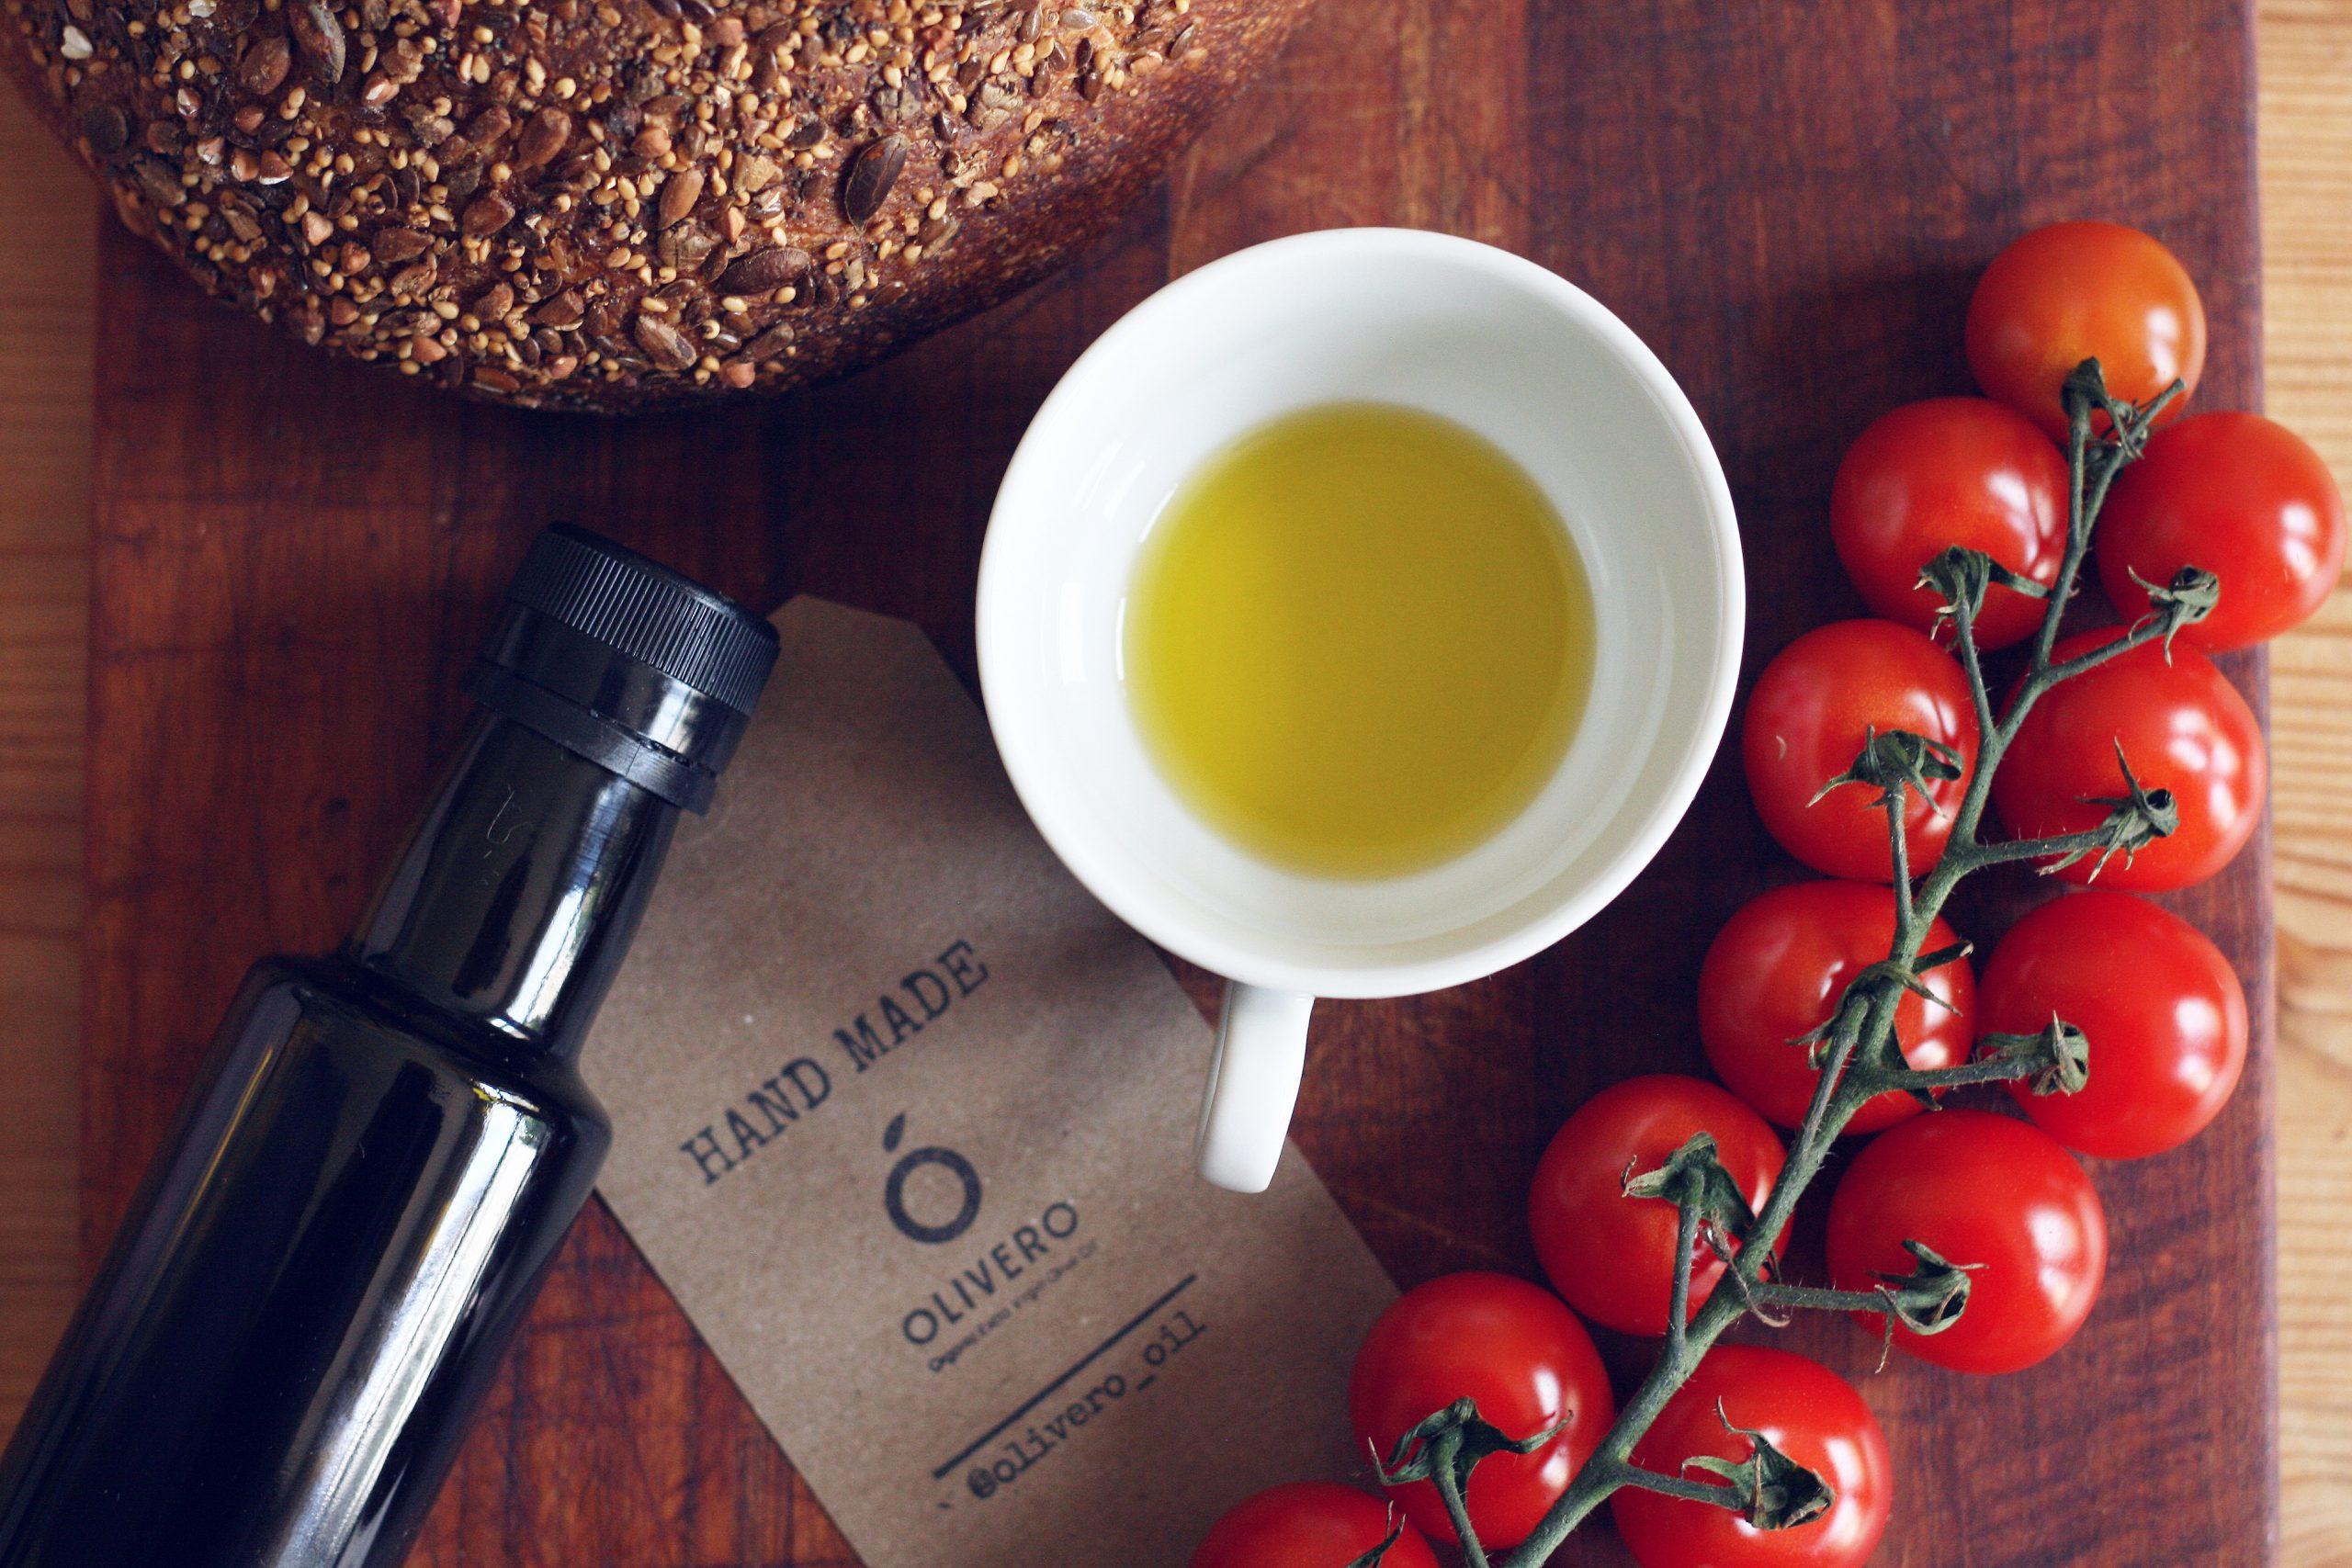 Olivero Olive Oil